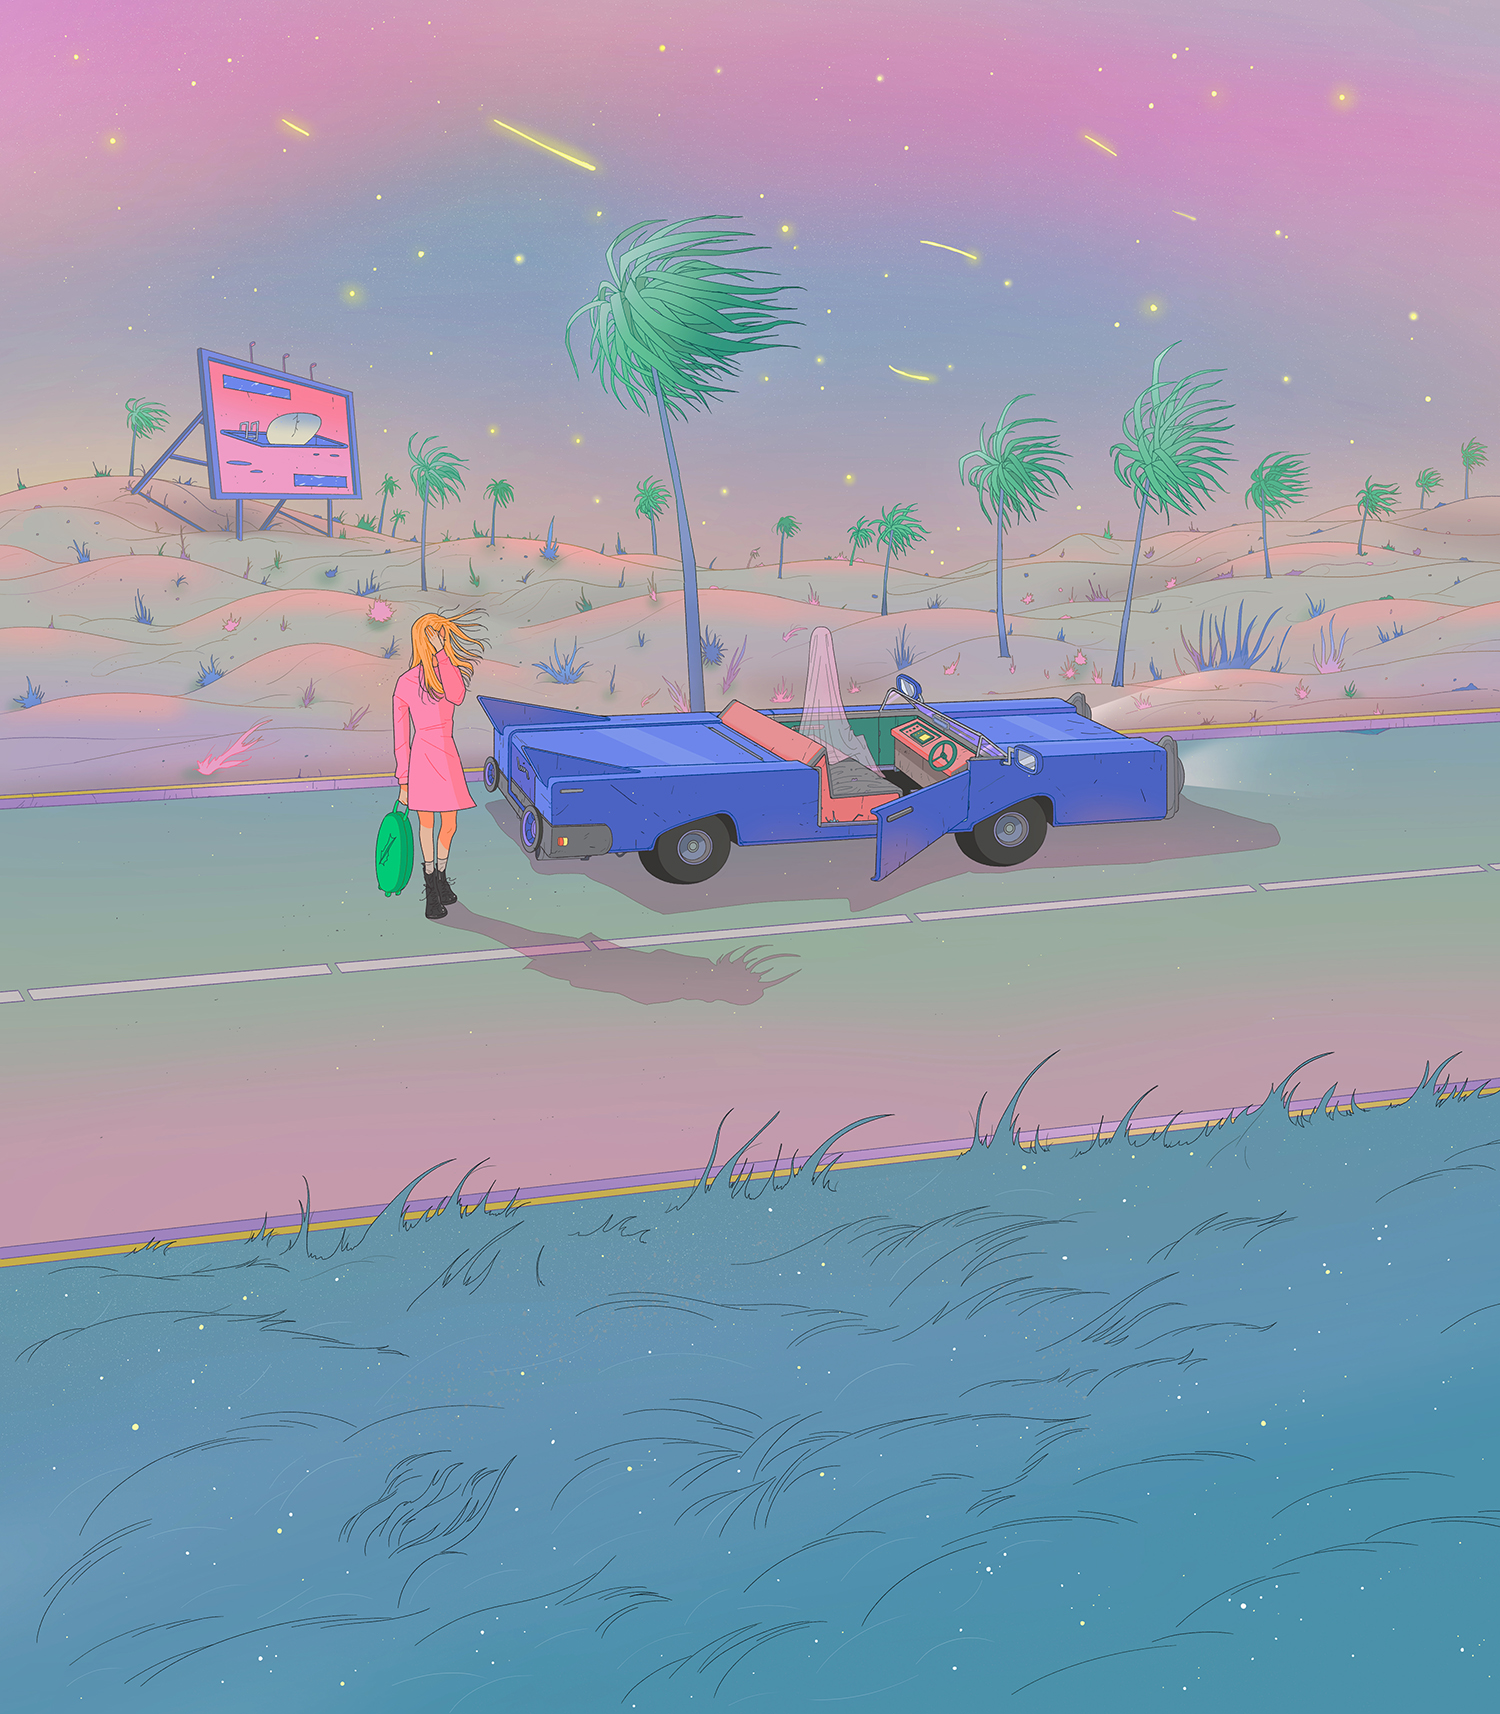 GirlsclubAsia-Illustrator-Seoyoung-tototatatu-7